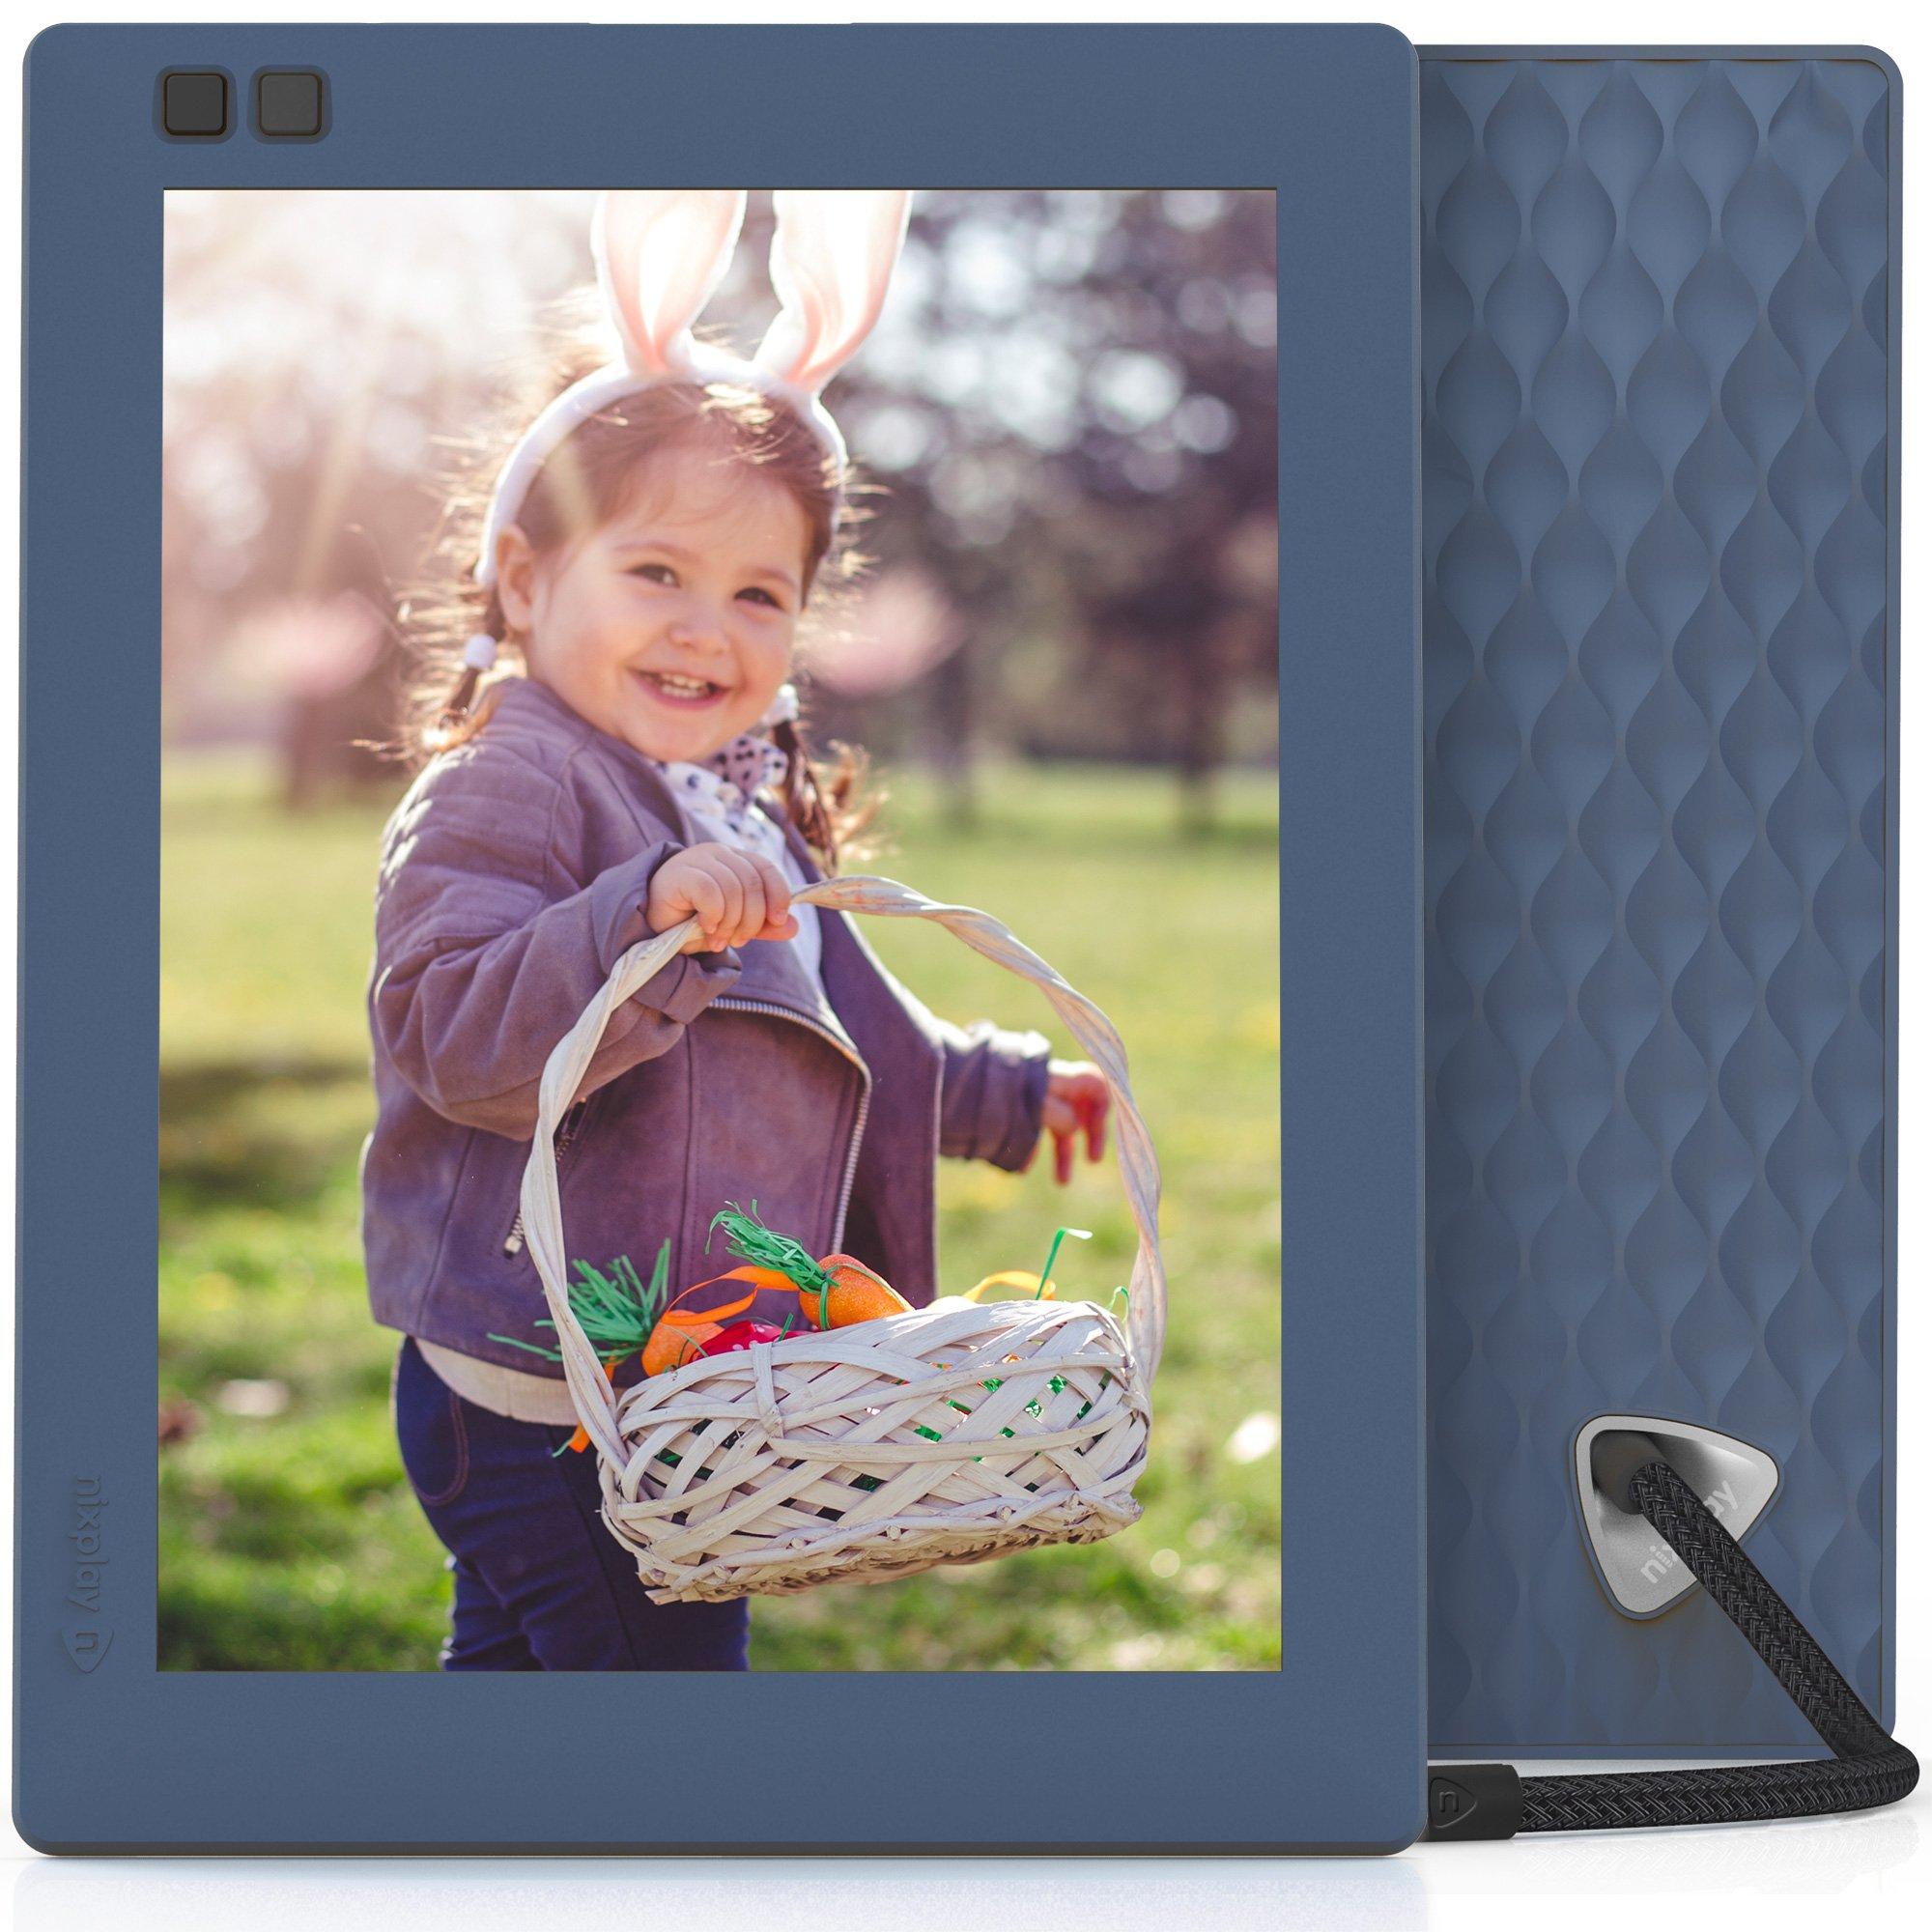 Nixplay Seed 8 inch WiFi Digital Photo Frame - Blue by nixplay